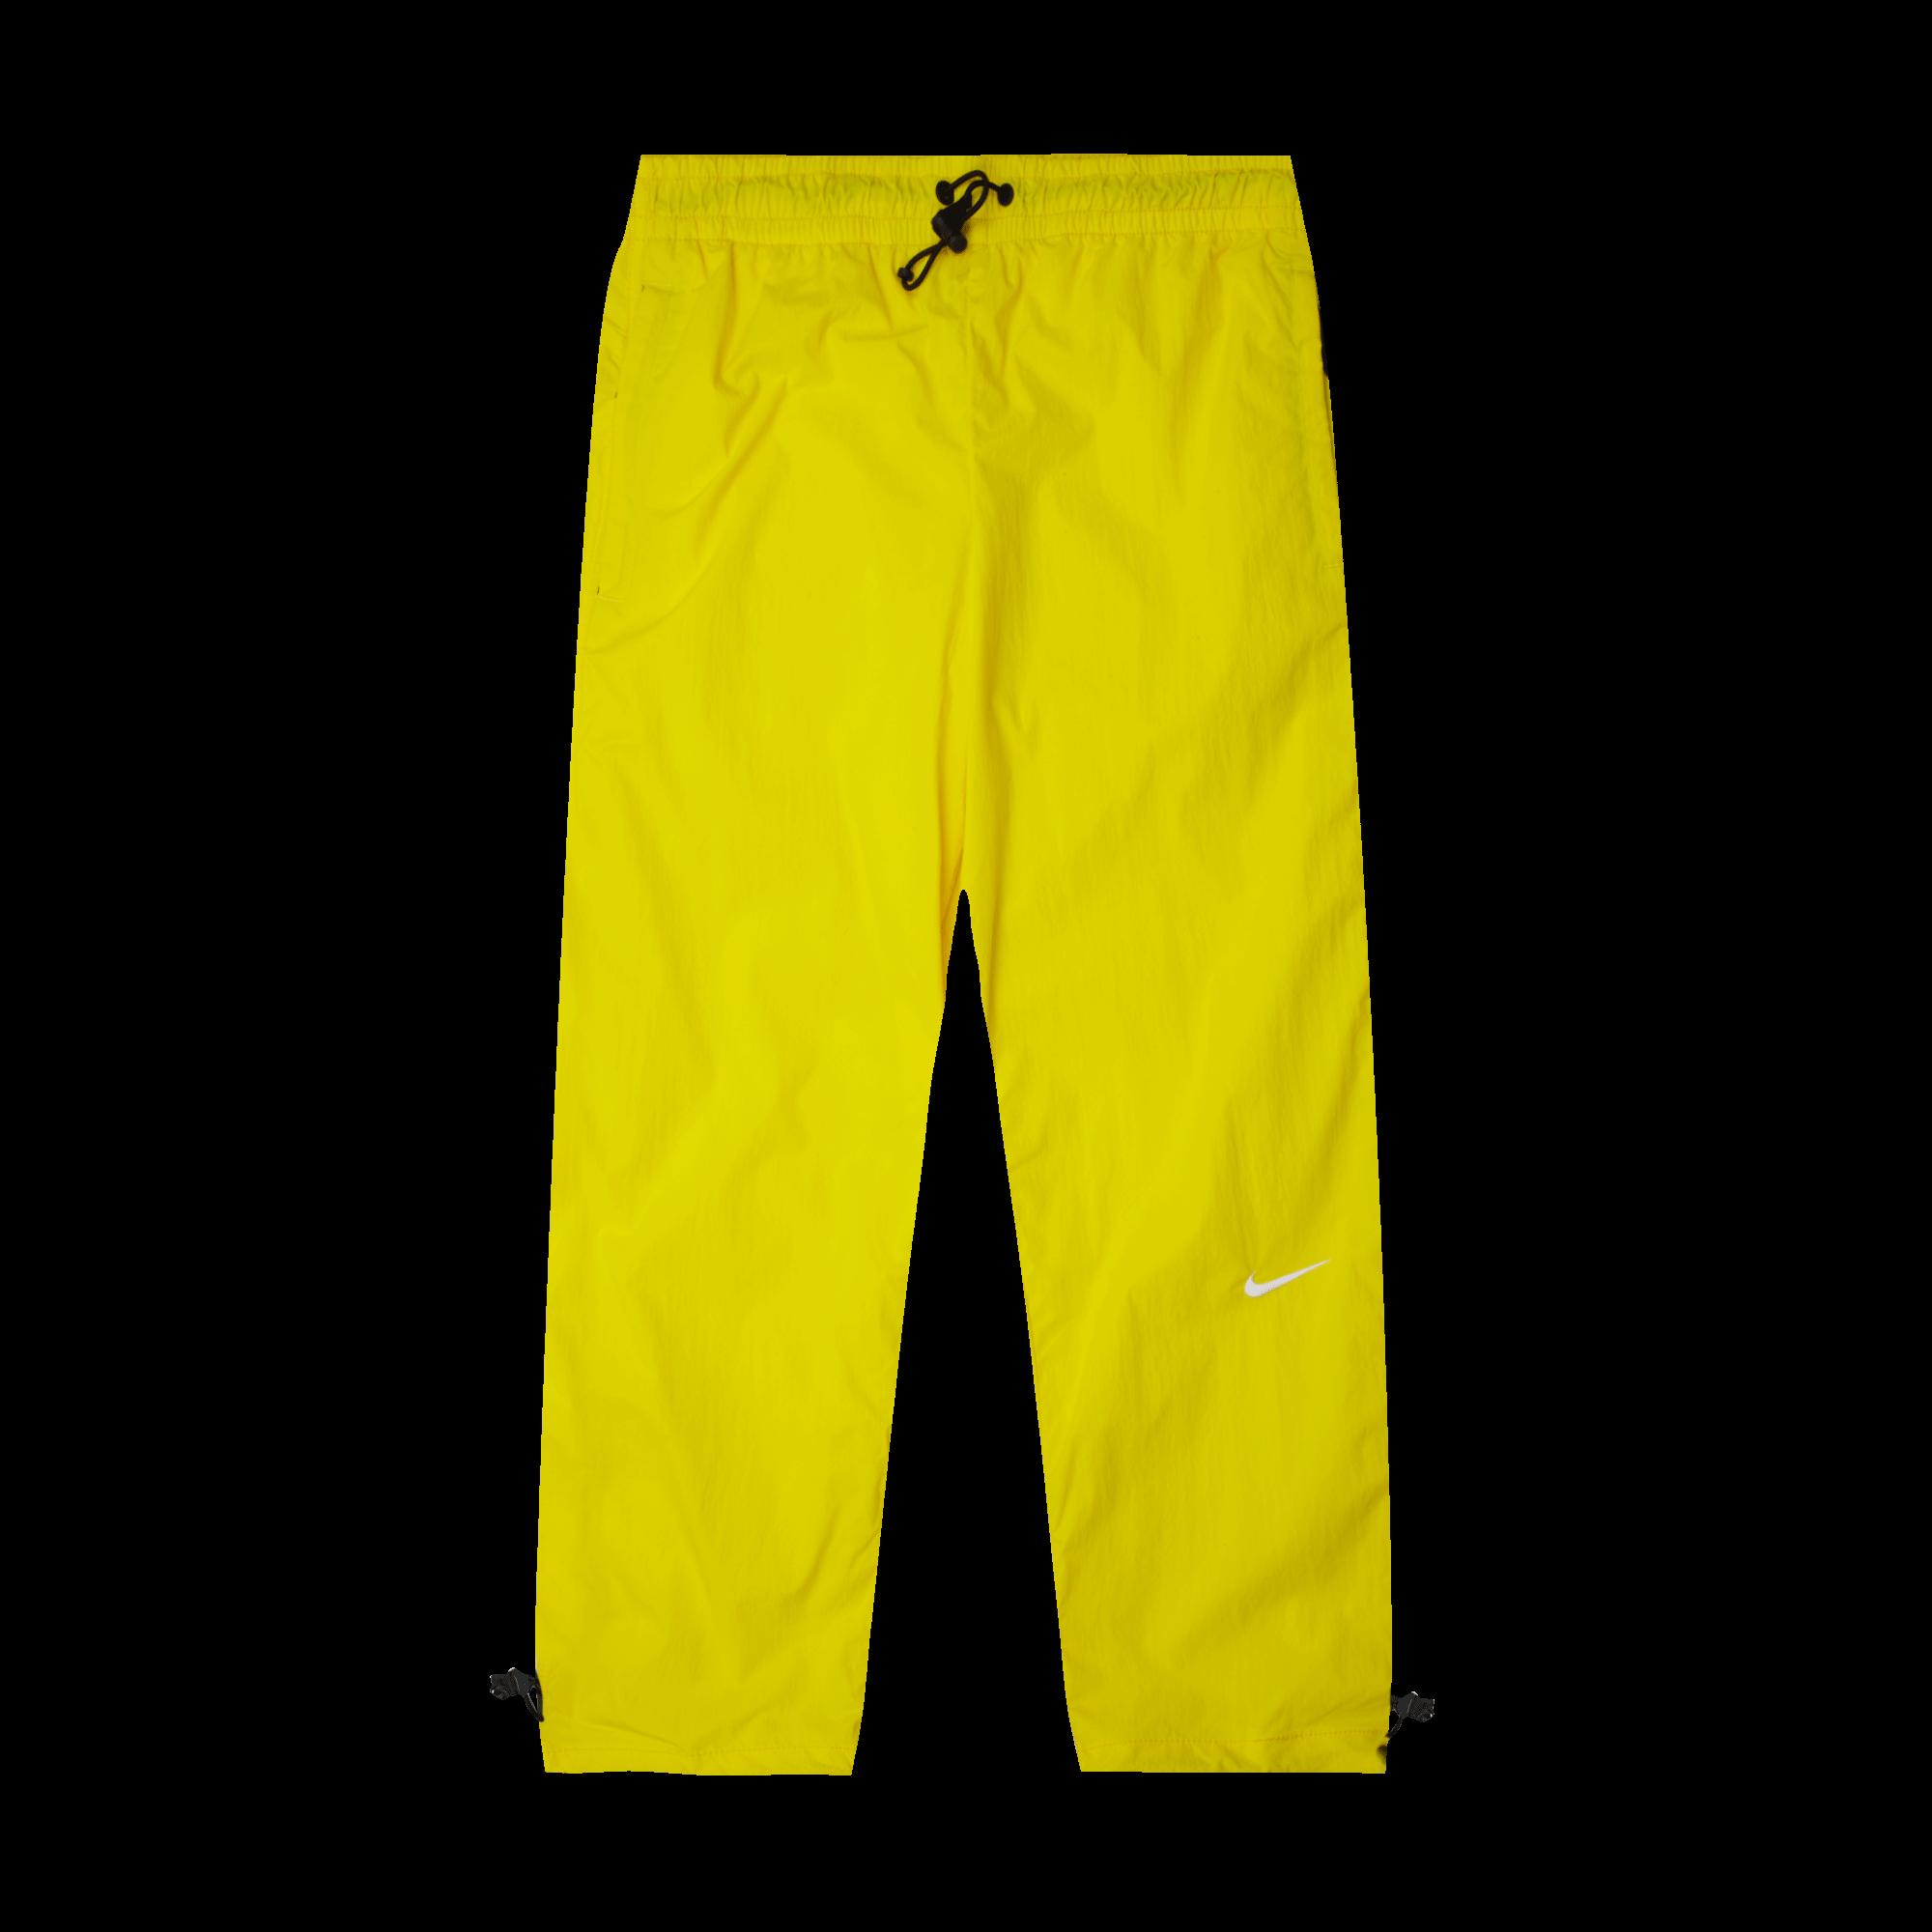 NikeLab NRG Pant yellow Pantaloni |